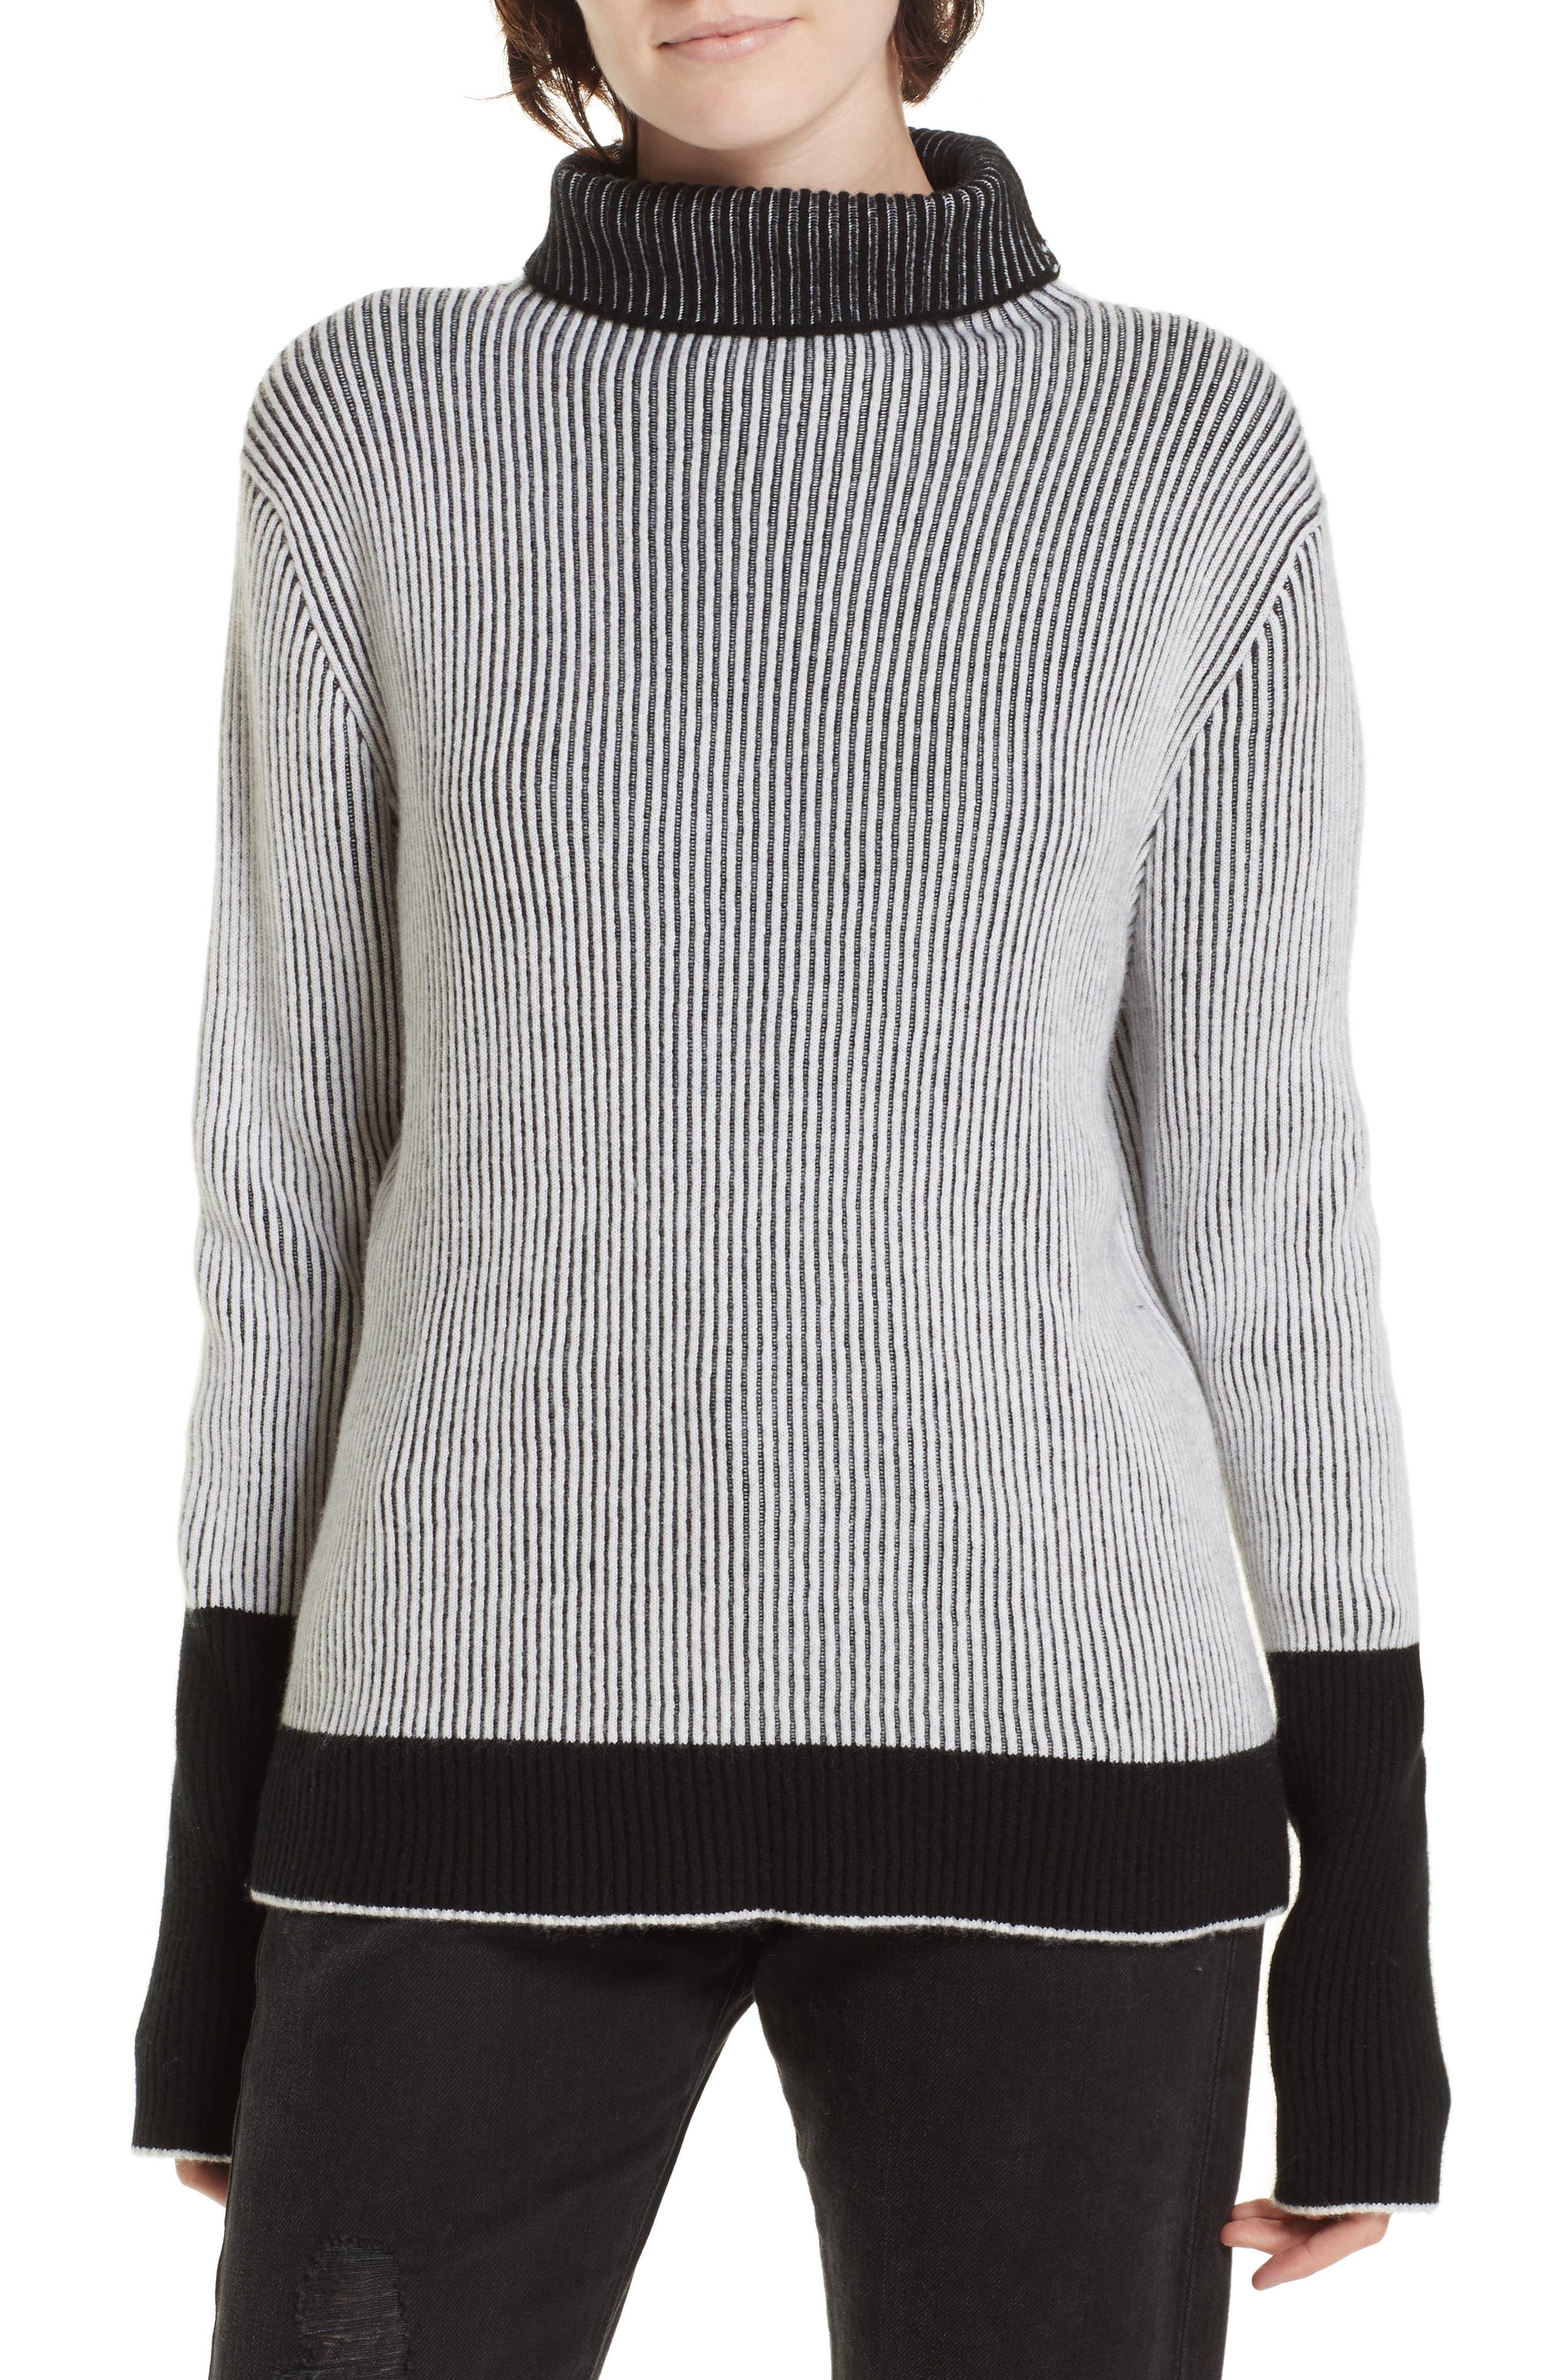 LA LIGNE Aaa Turtleneck Cashmere Sweater in Cream/ Black